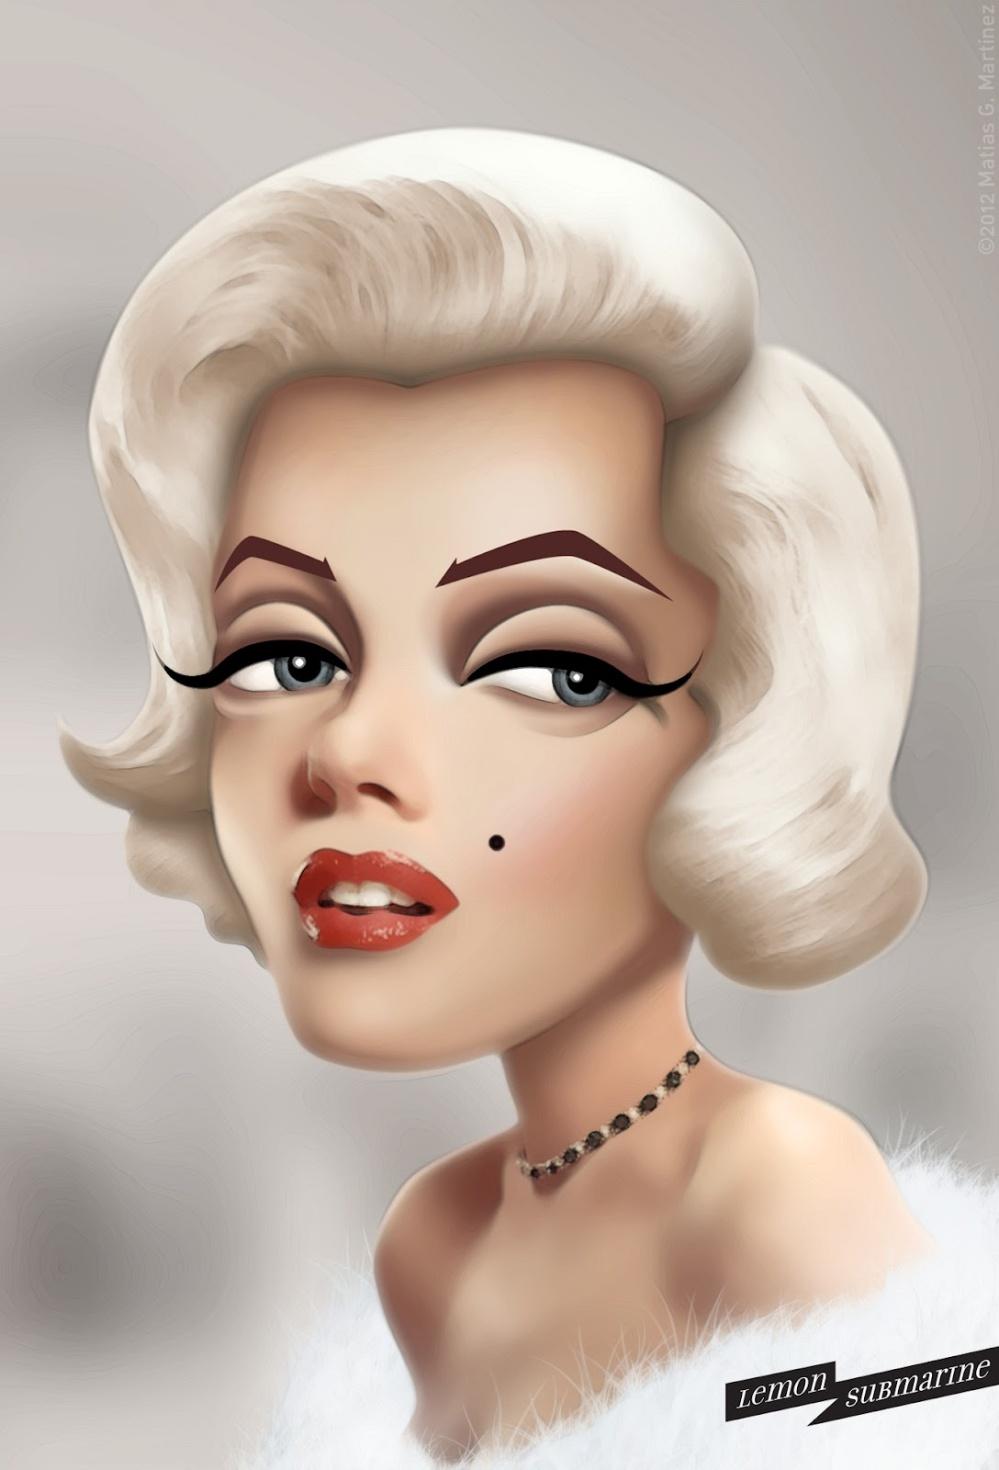 Marilyn Monroe by Matias G. Martinez LEMONSUBMARINE 01 170713